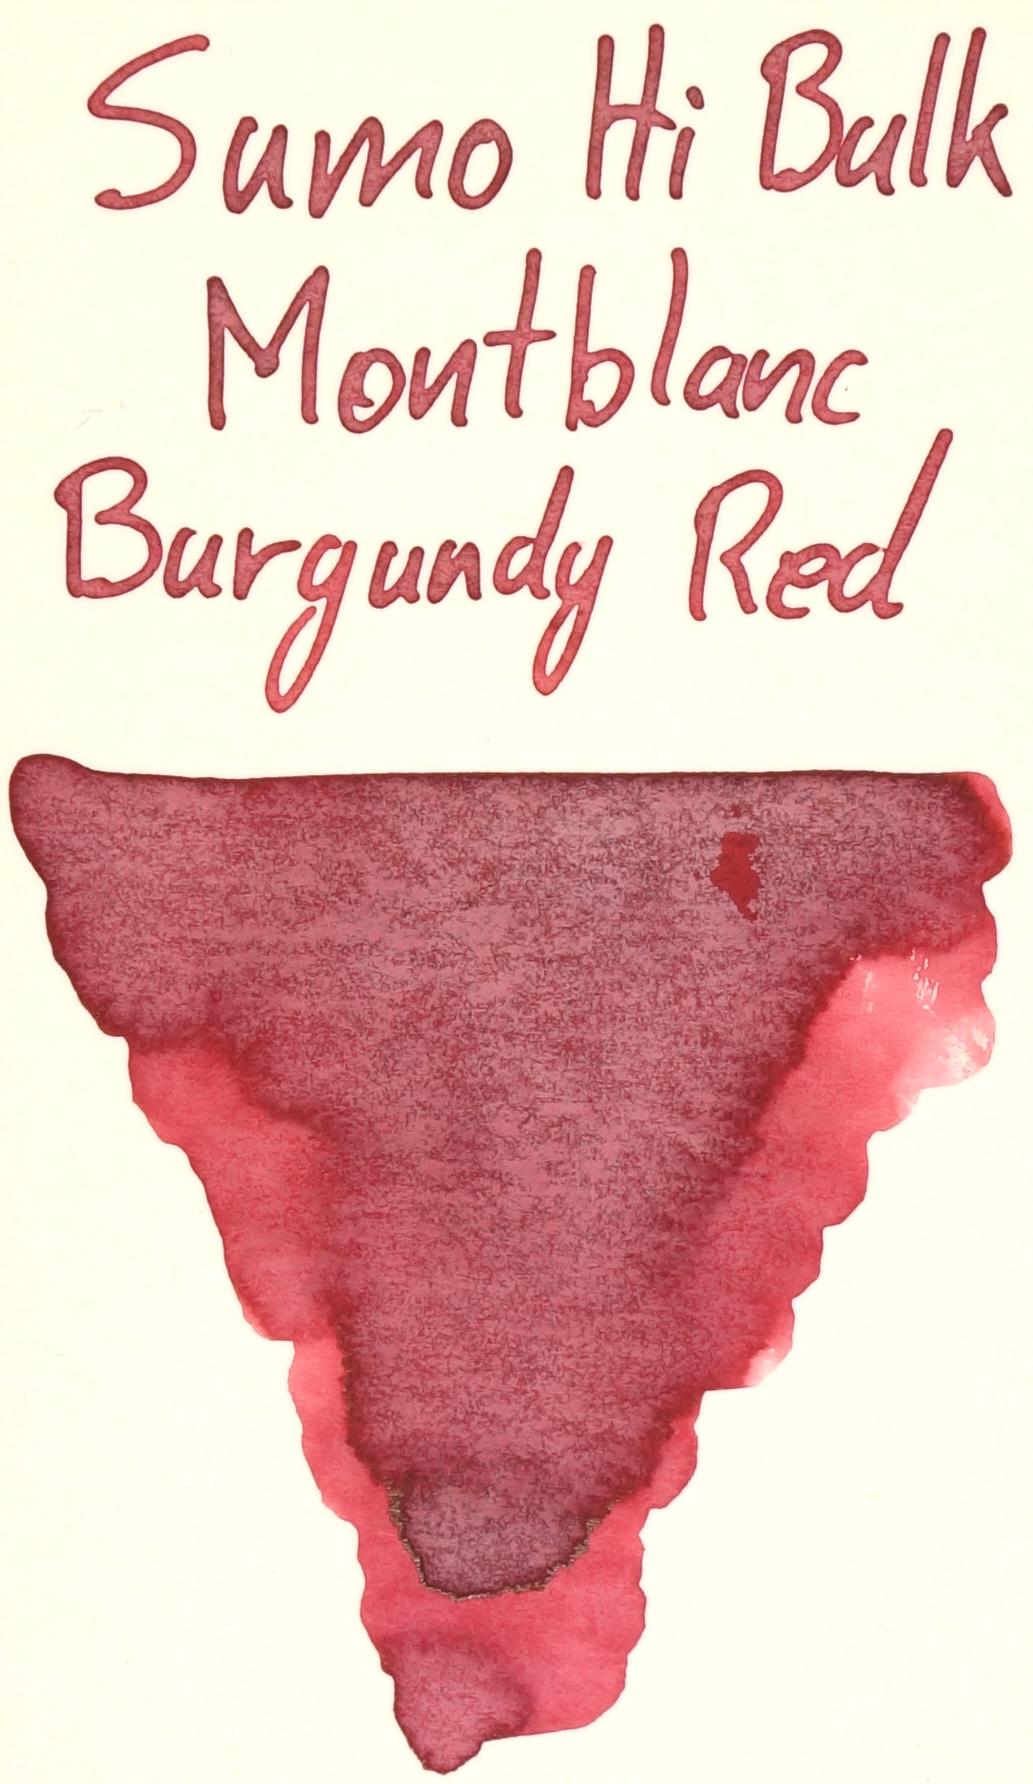 Montblanc Burgundy Red Sumo Hi Bulk.JPG